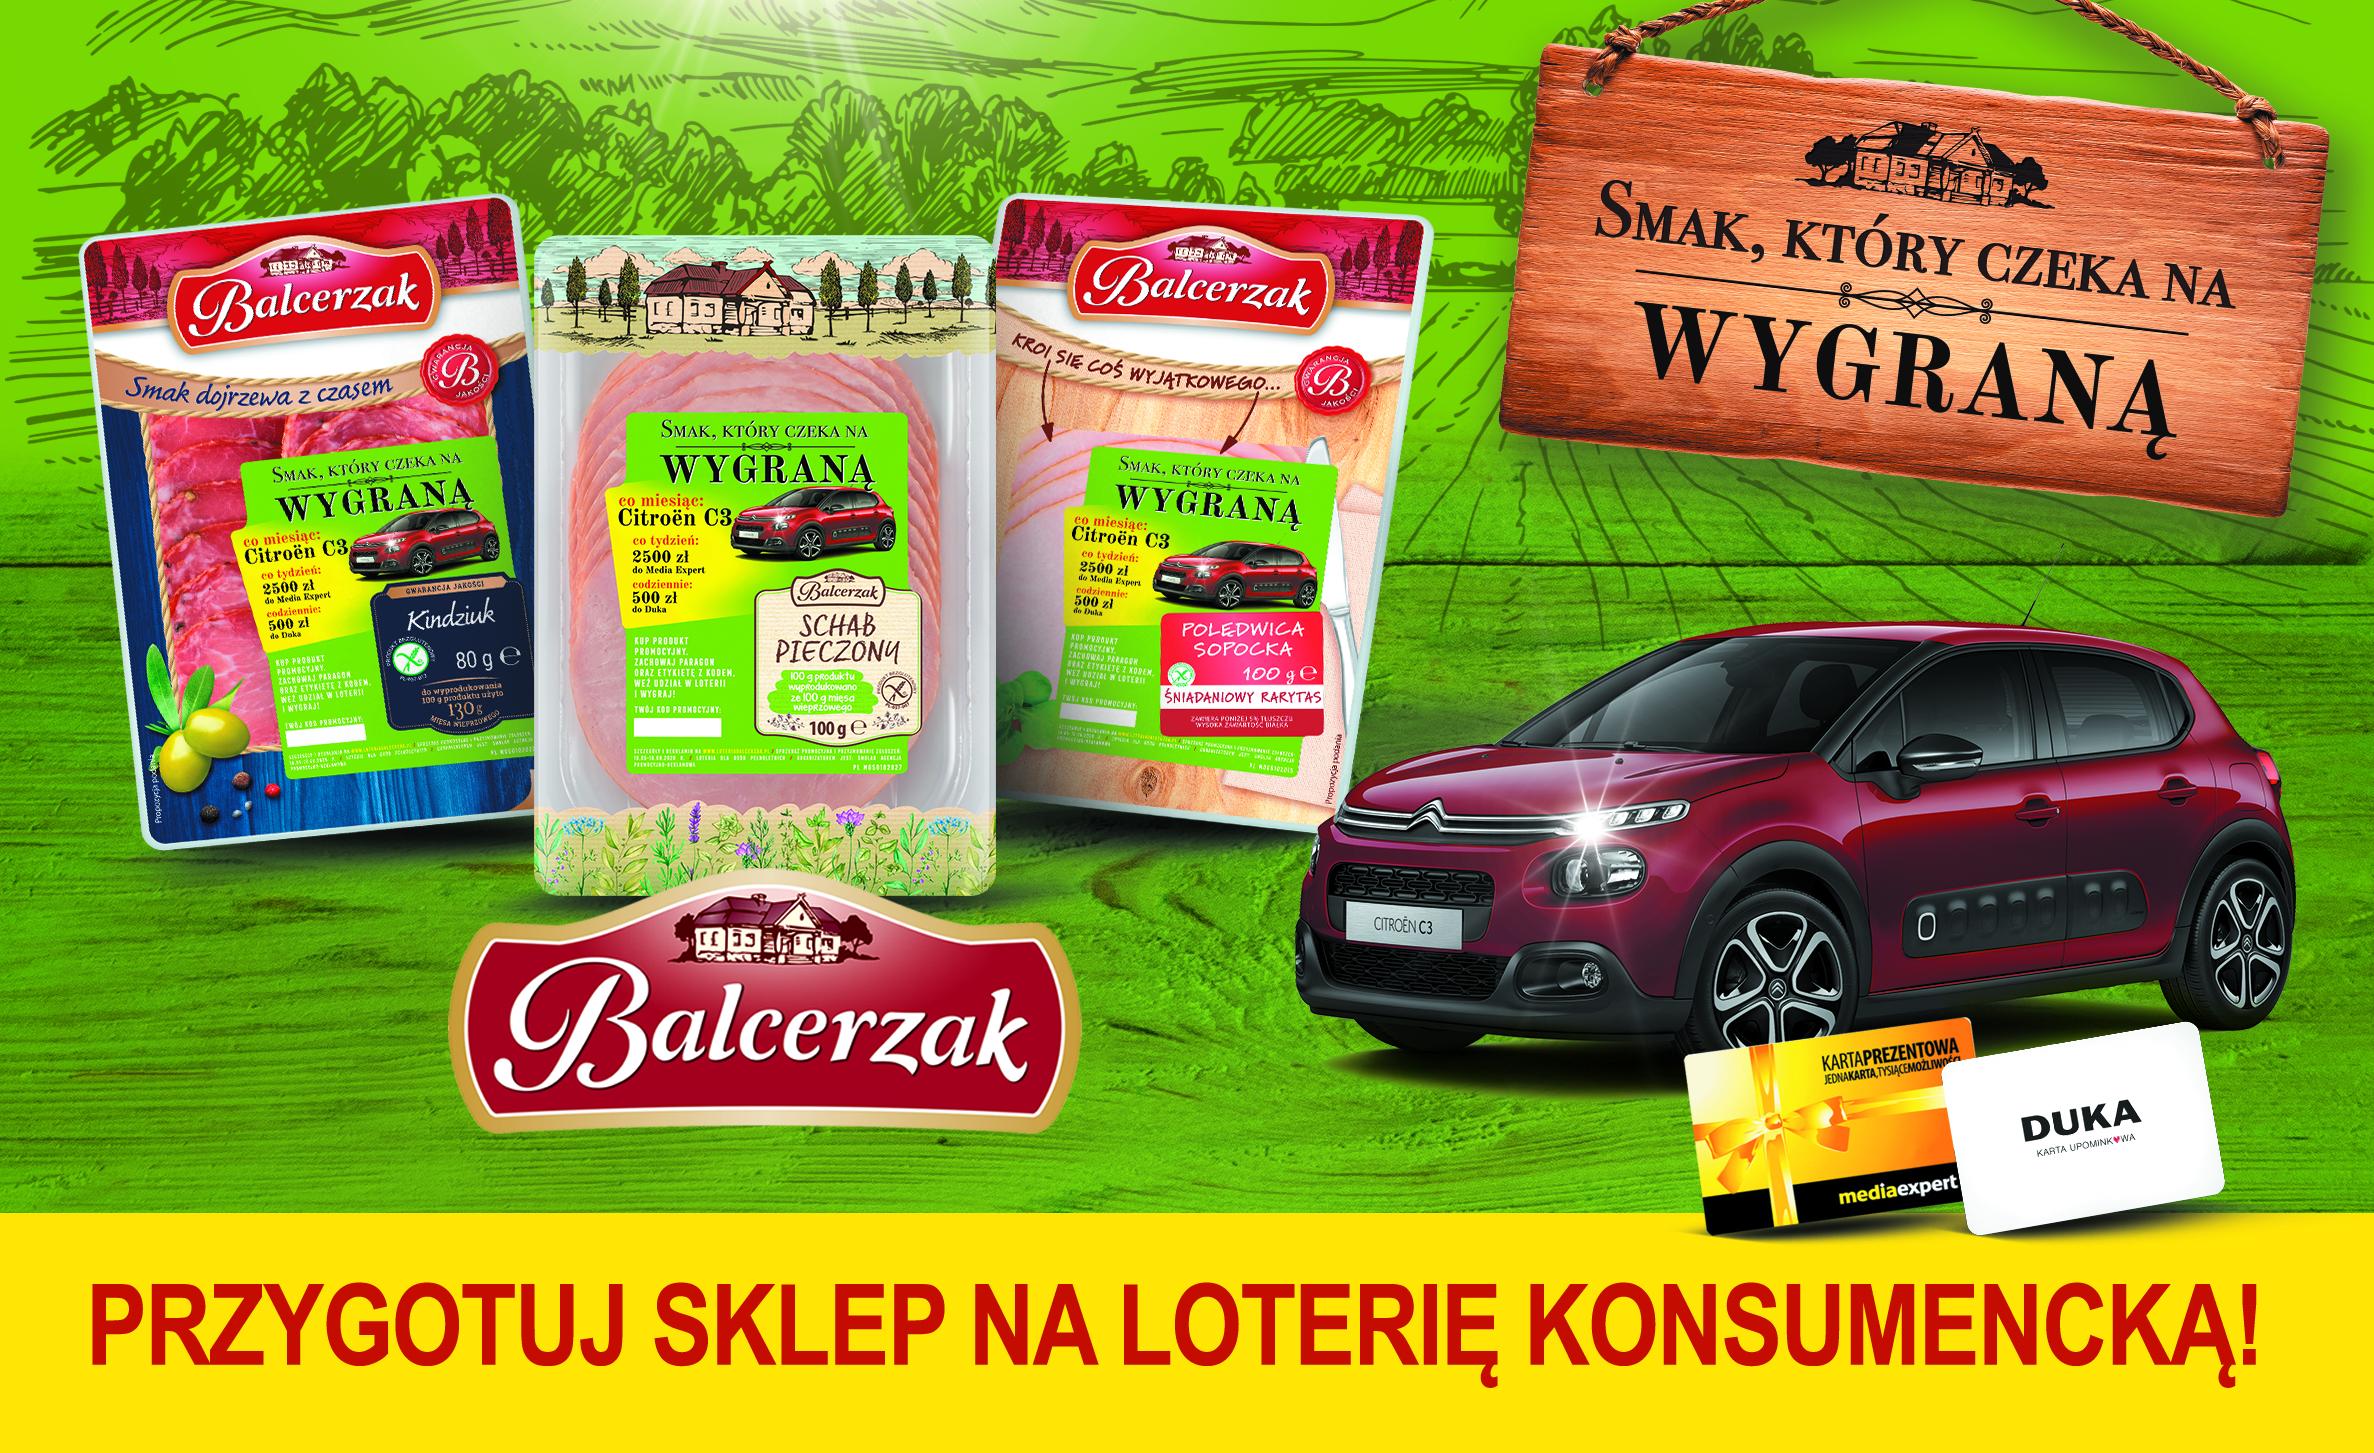 Loteria konsumencka wędlin Balcerzak